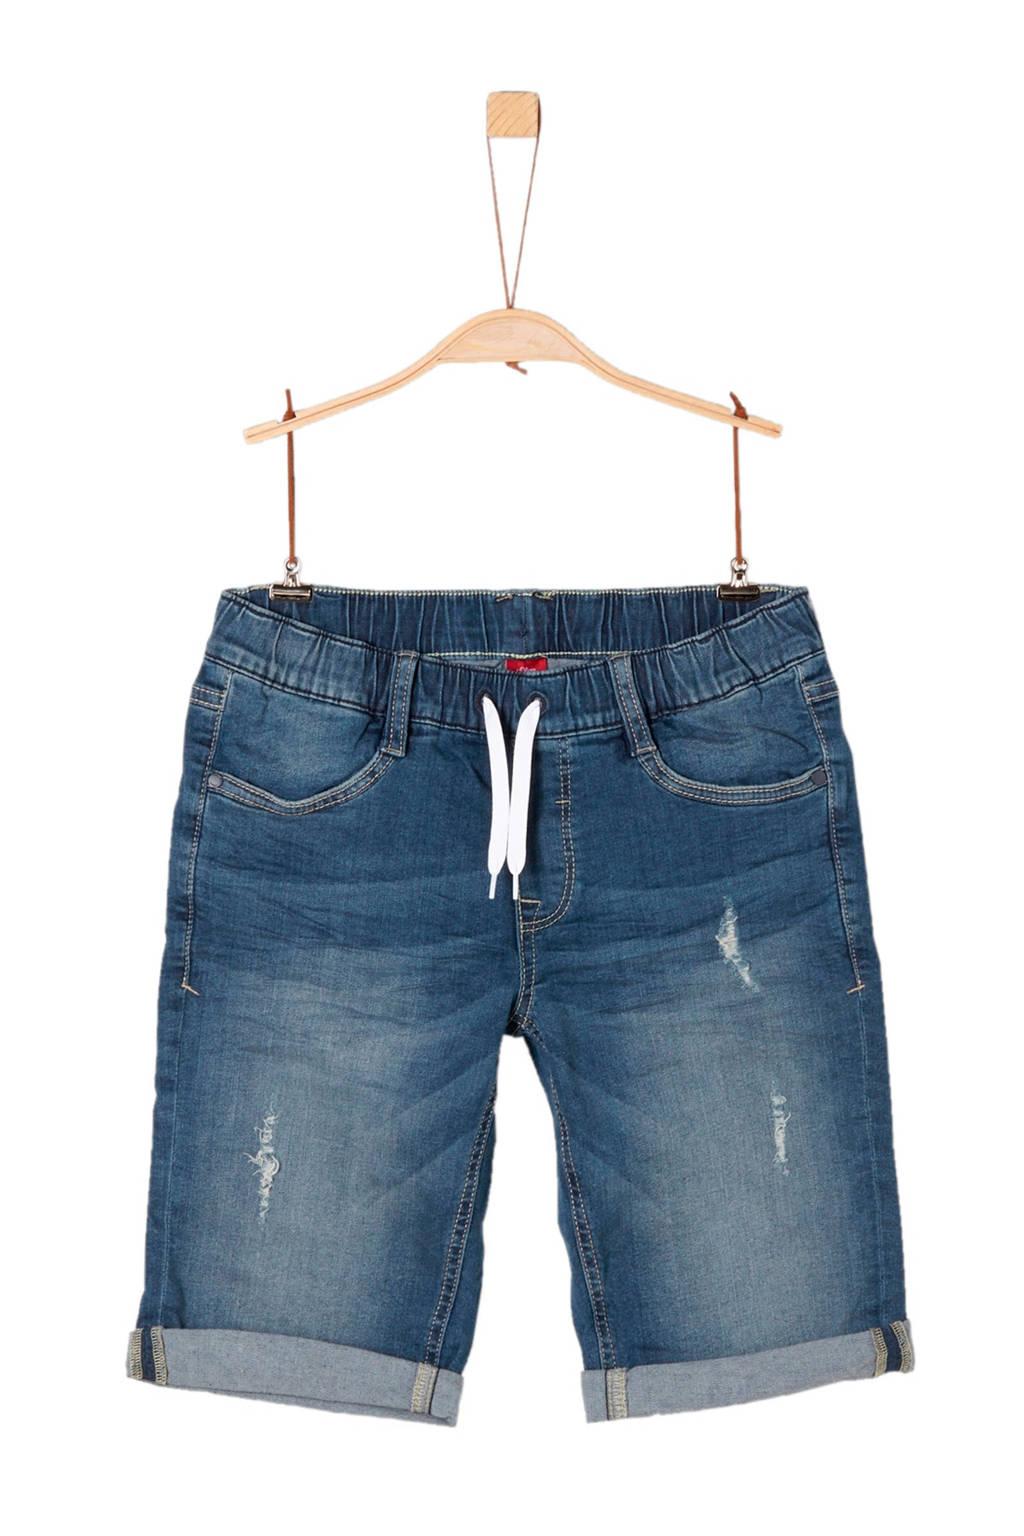 s.Oliver jeans bermuda, Stonewashed